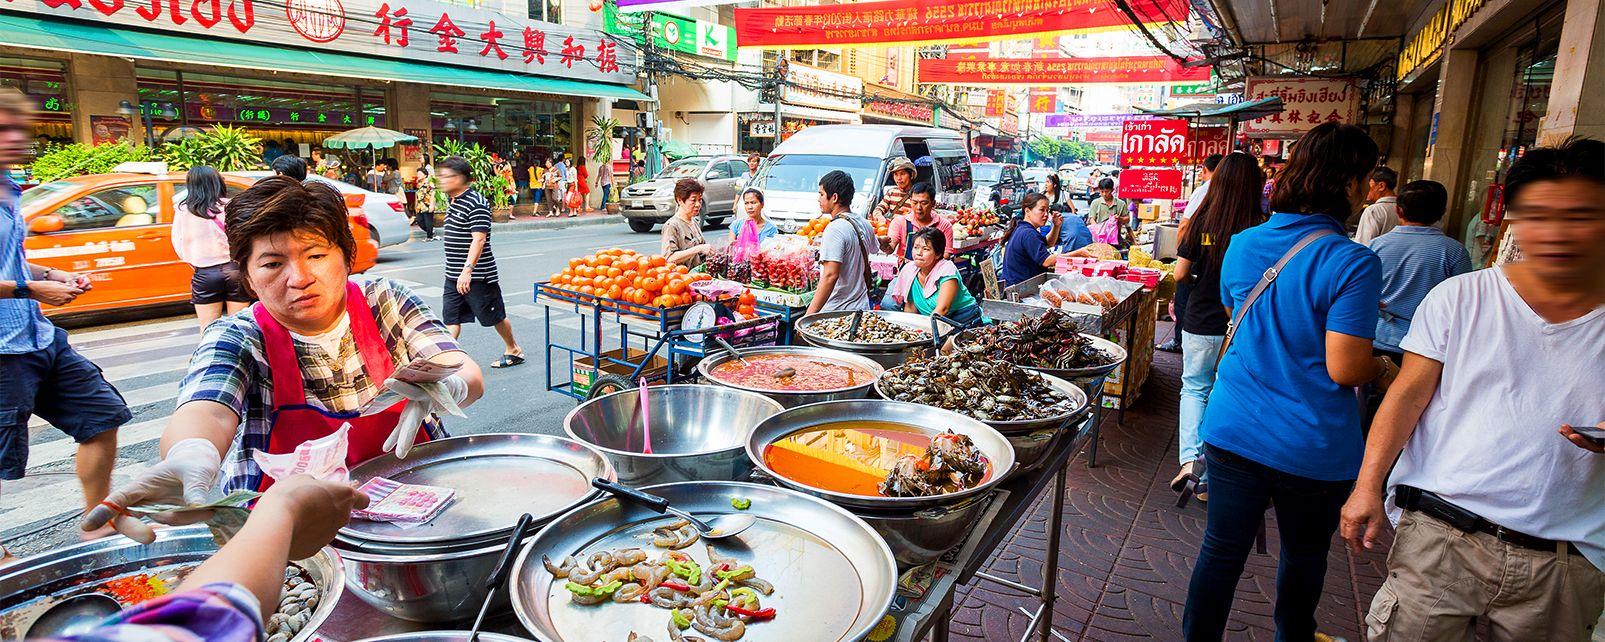 , Lo Street Food, La gastronomie, Thaïlande